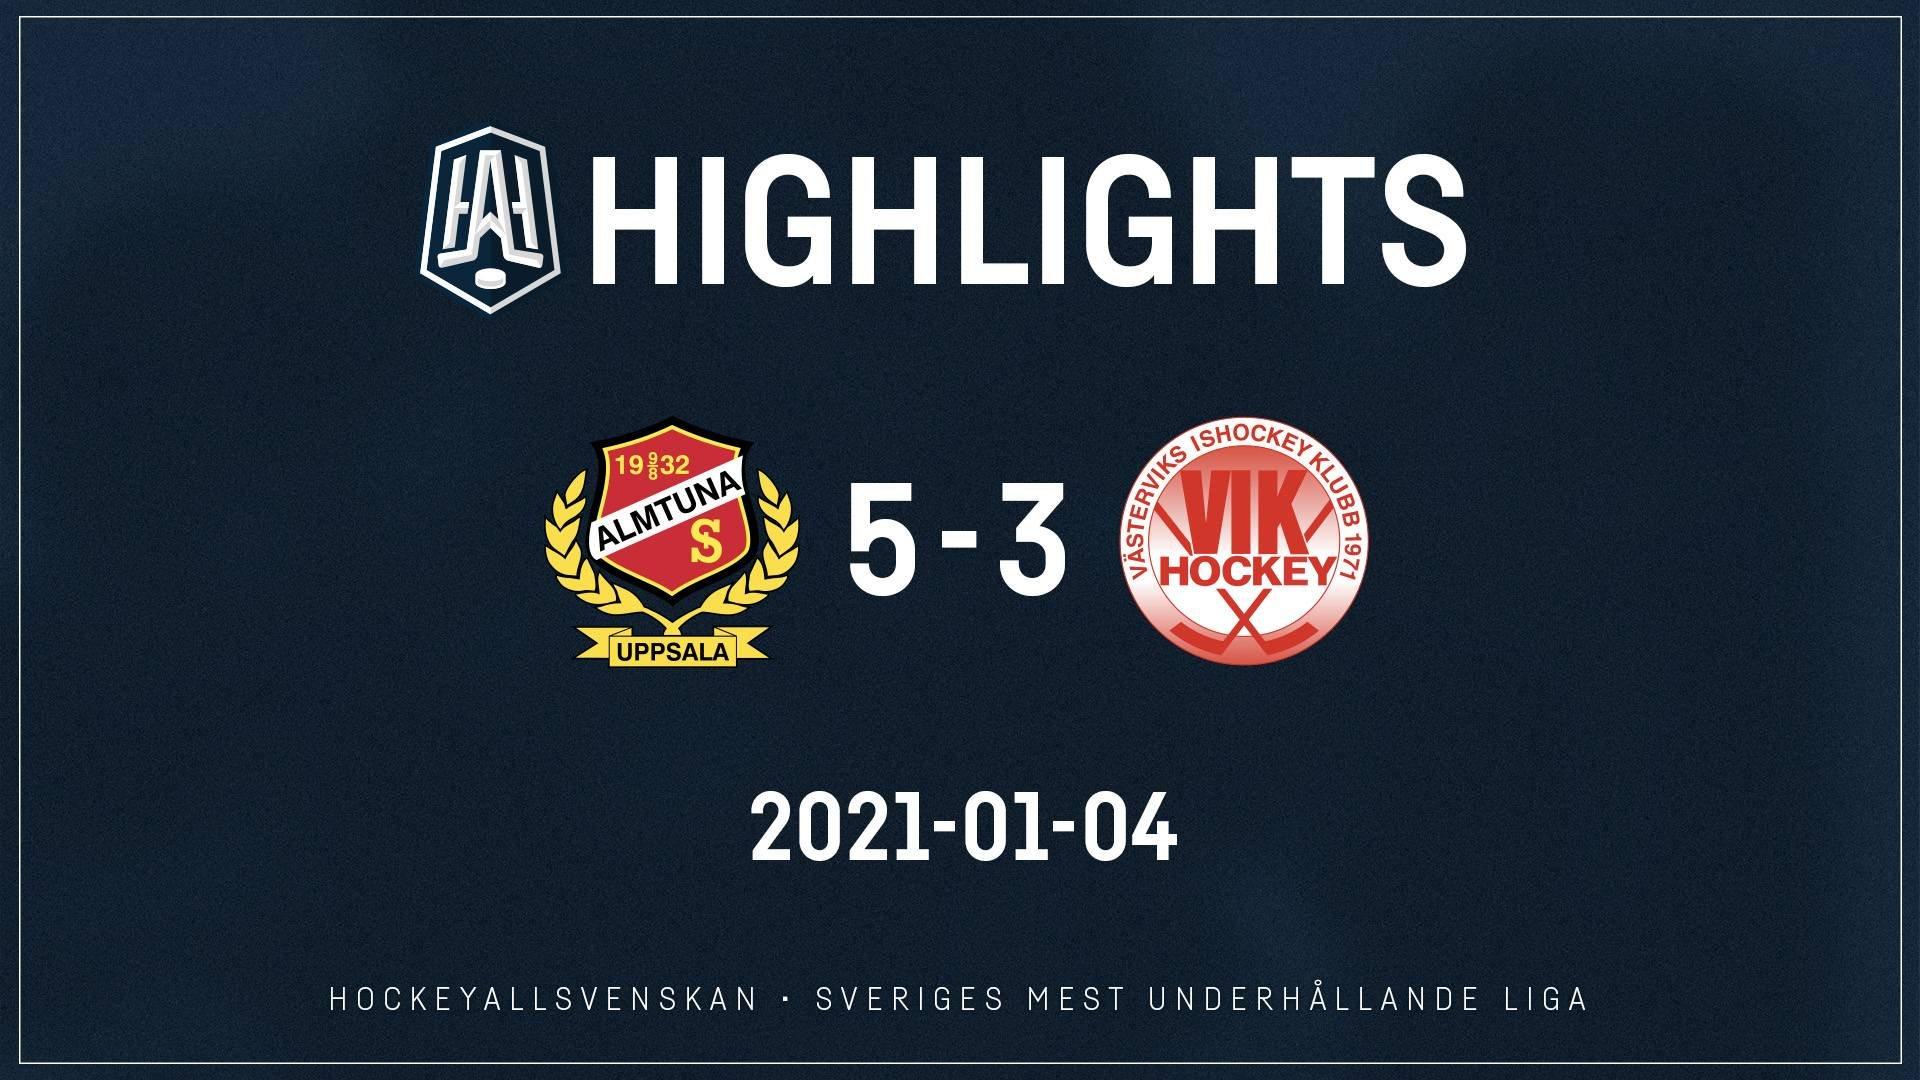 2021-01-04 Almtuna - Västervik 5-3